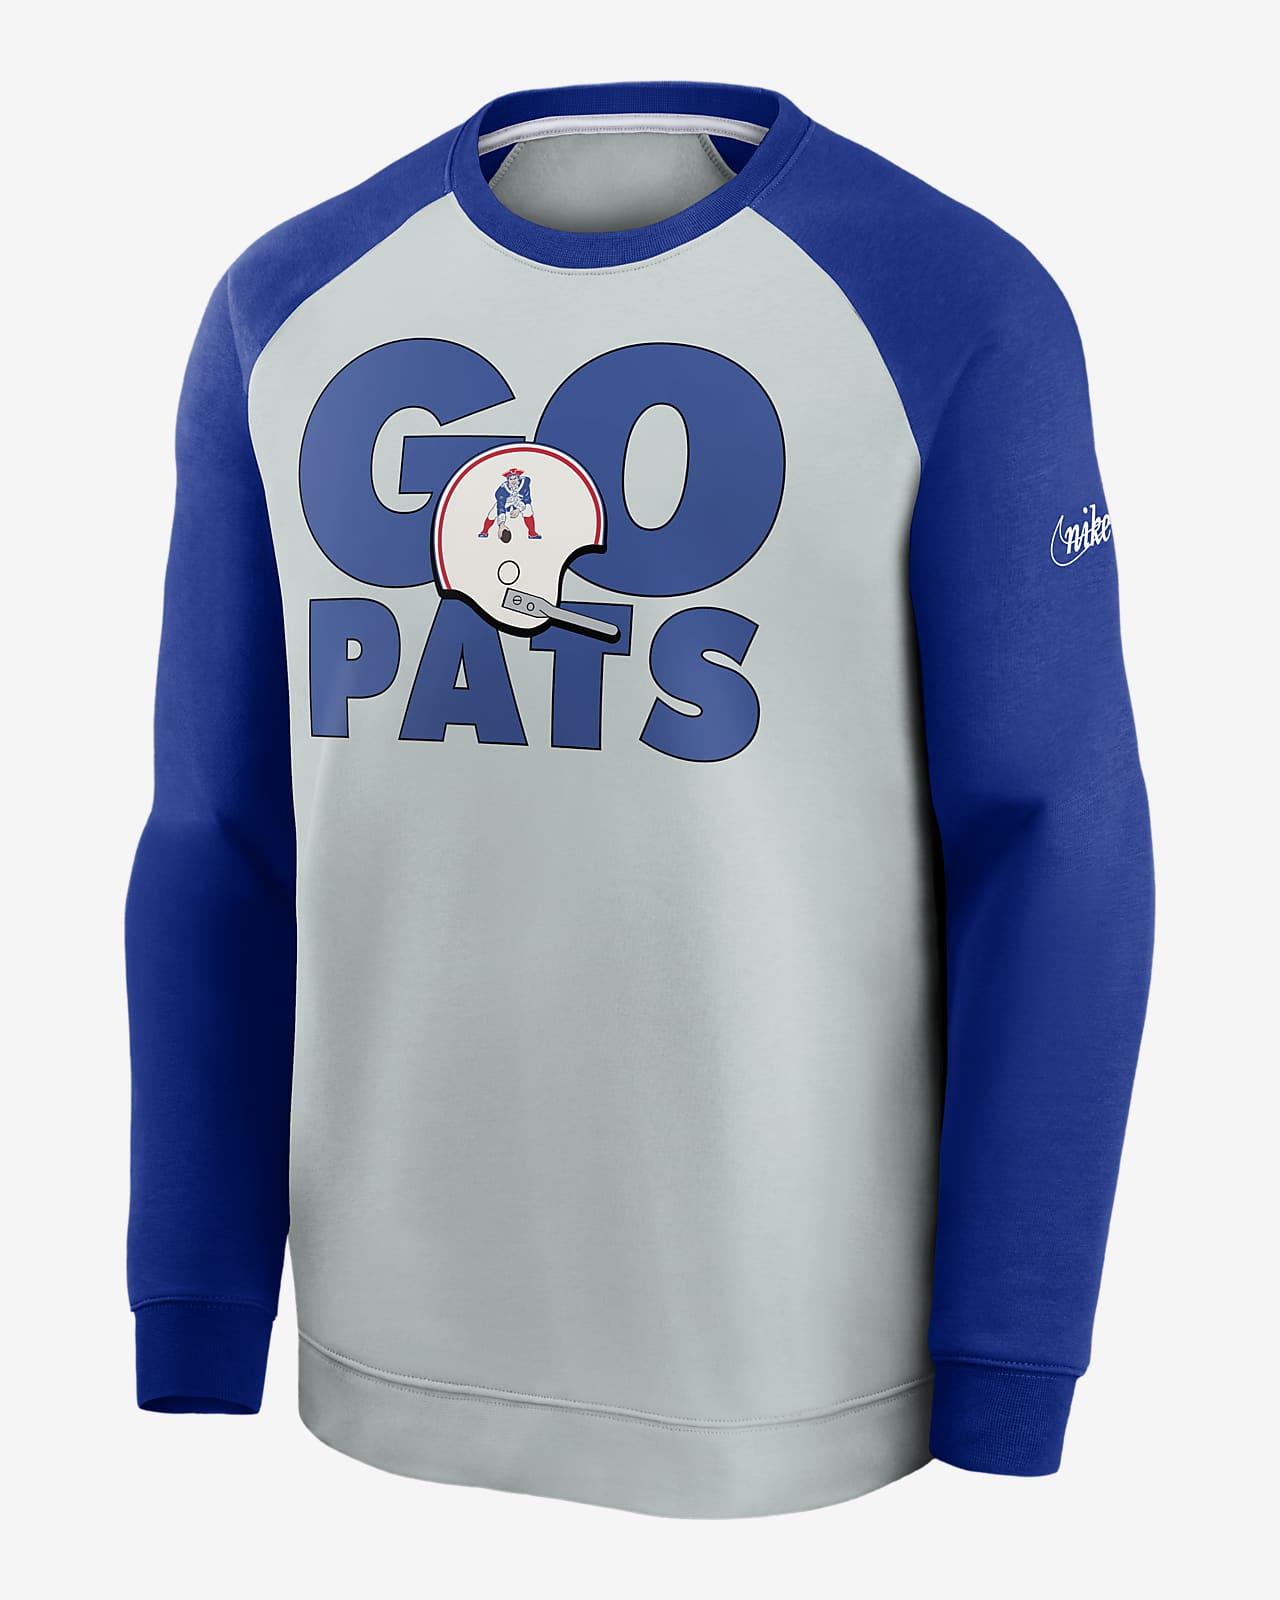 Nike Historic Raglan (NFL Patriots) Men's Sweatshirt